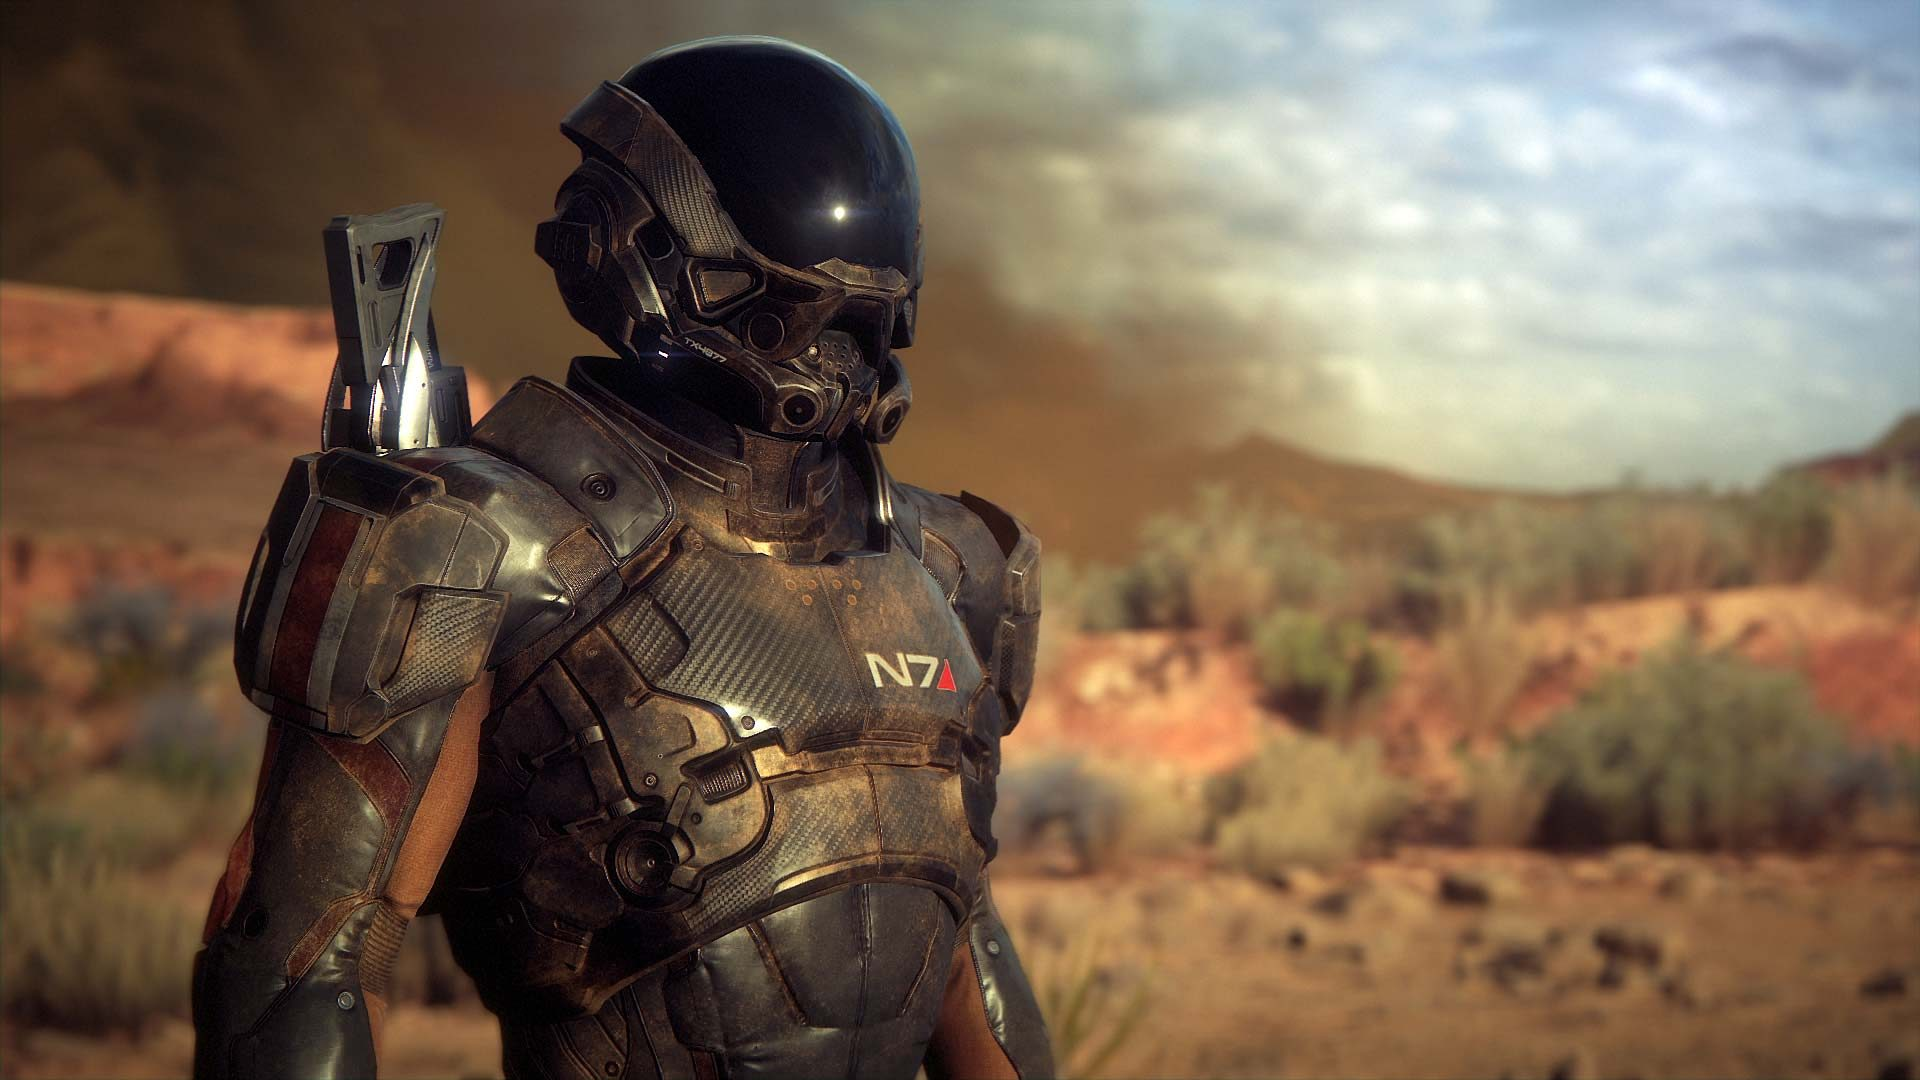 Game of Thrones et Kaamelott s'invitent dans Mass Effect : Andromeda